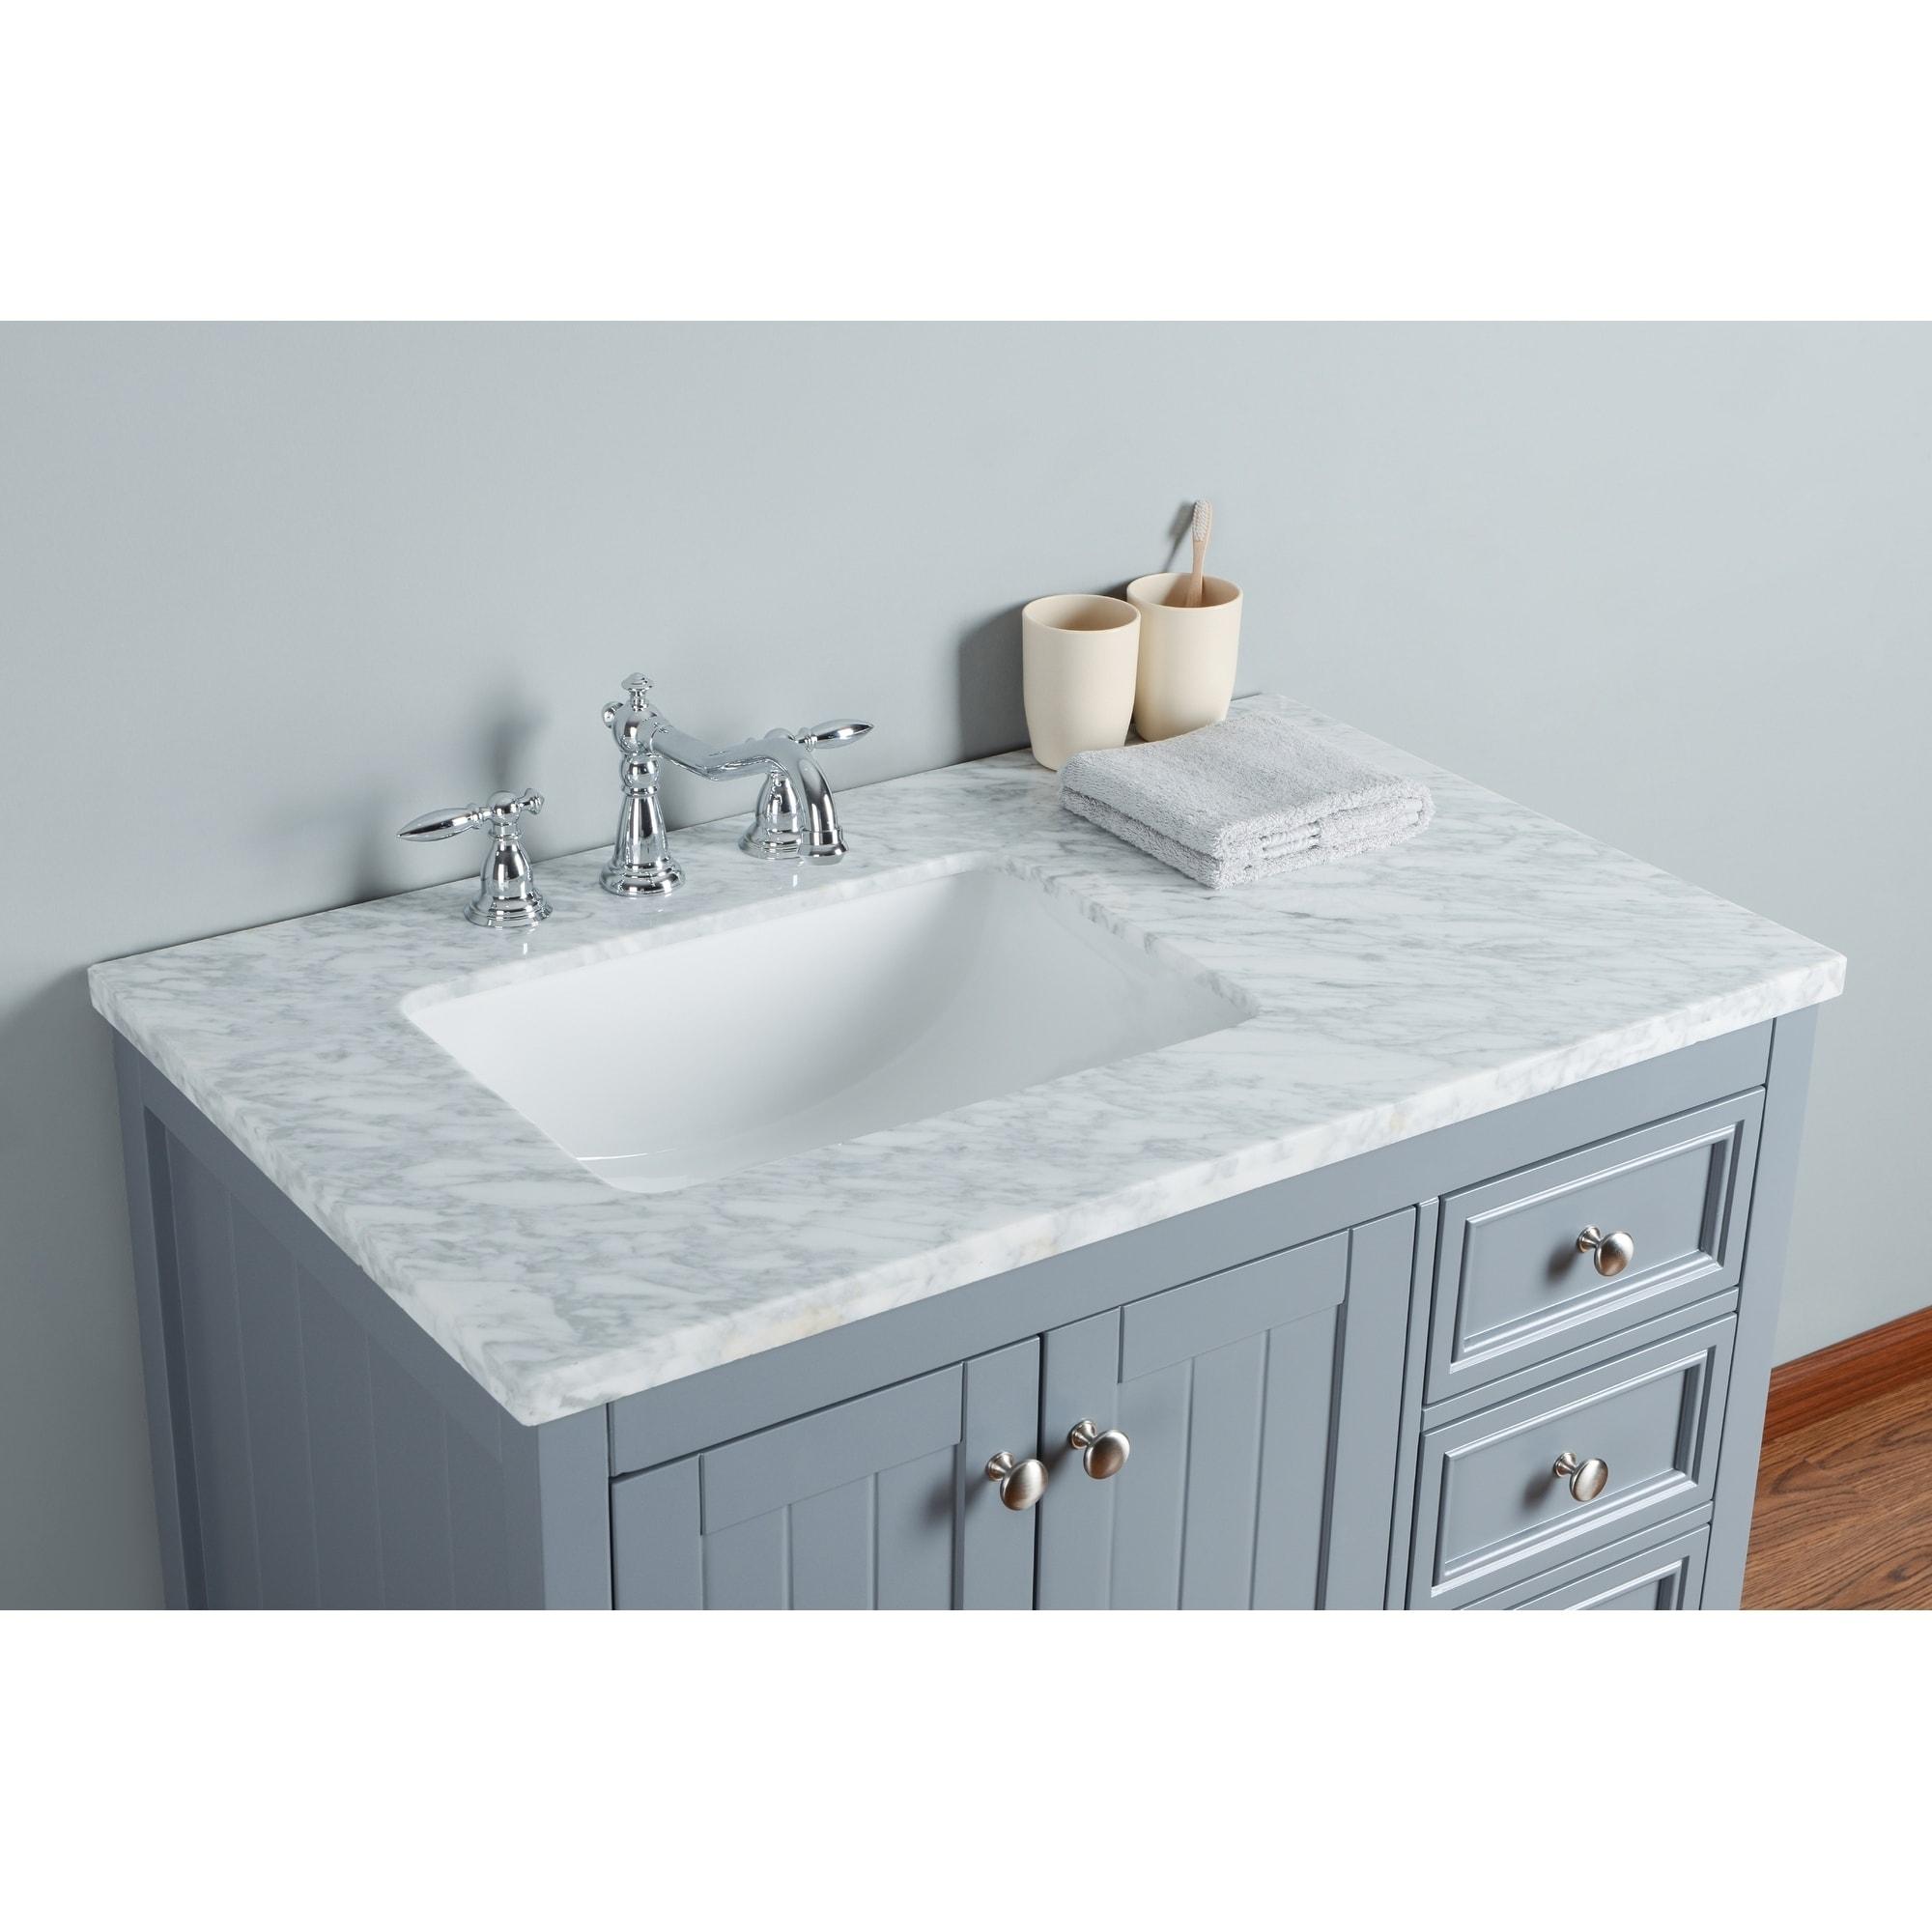 Single, Modern & Contemporary Bathroom Vanities & Vanity Cabinets ...